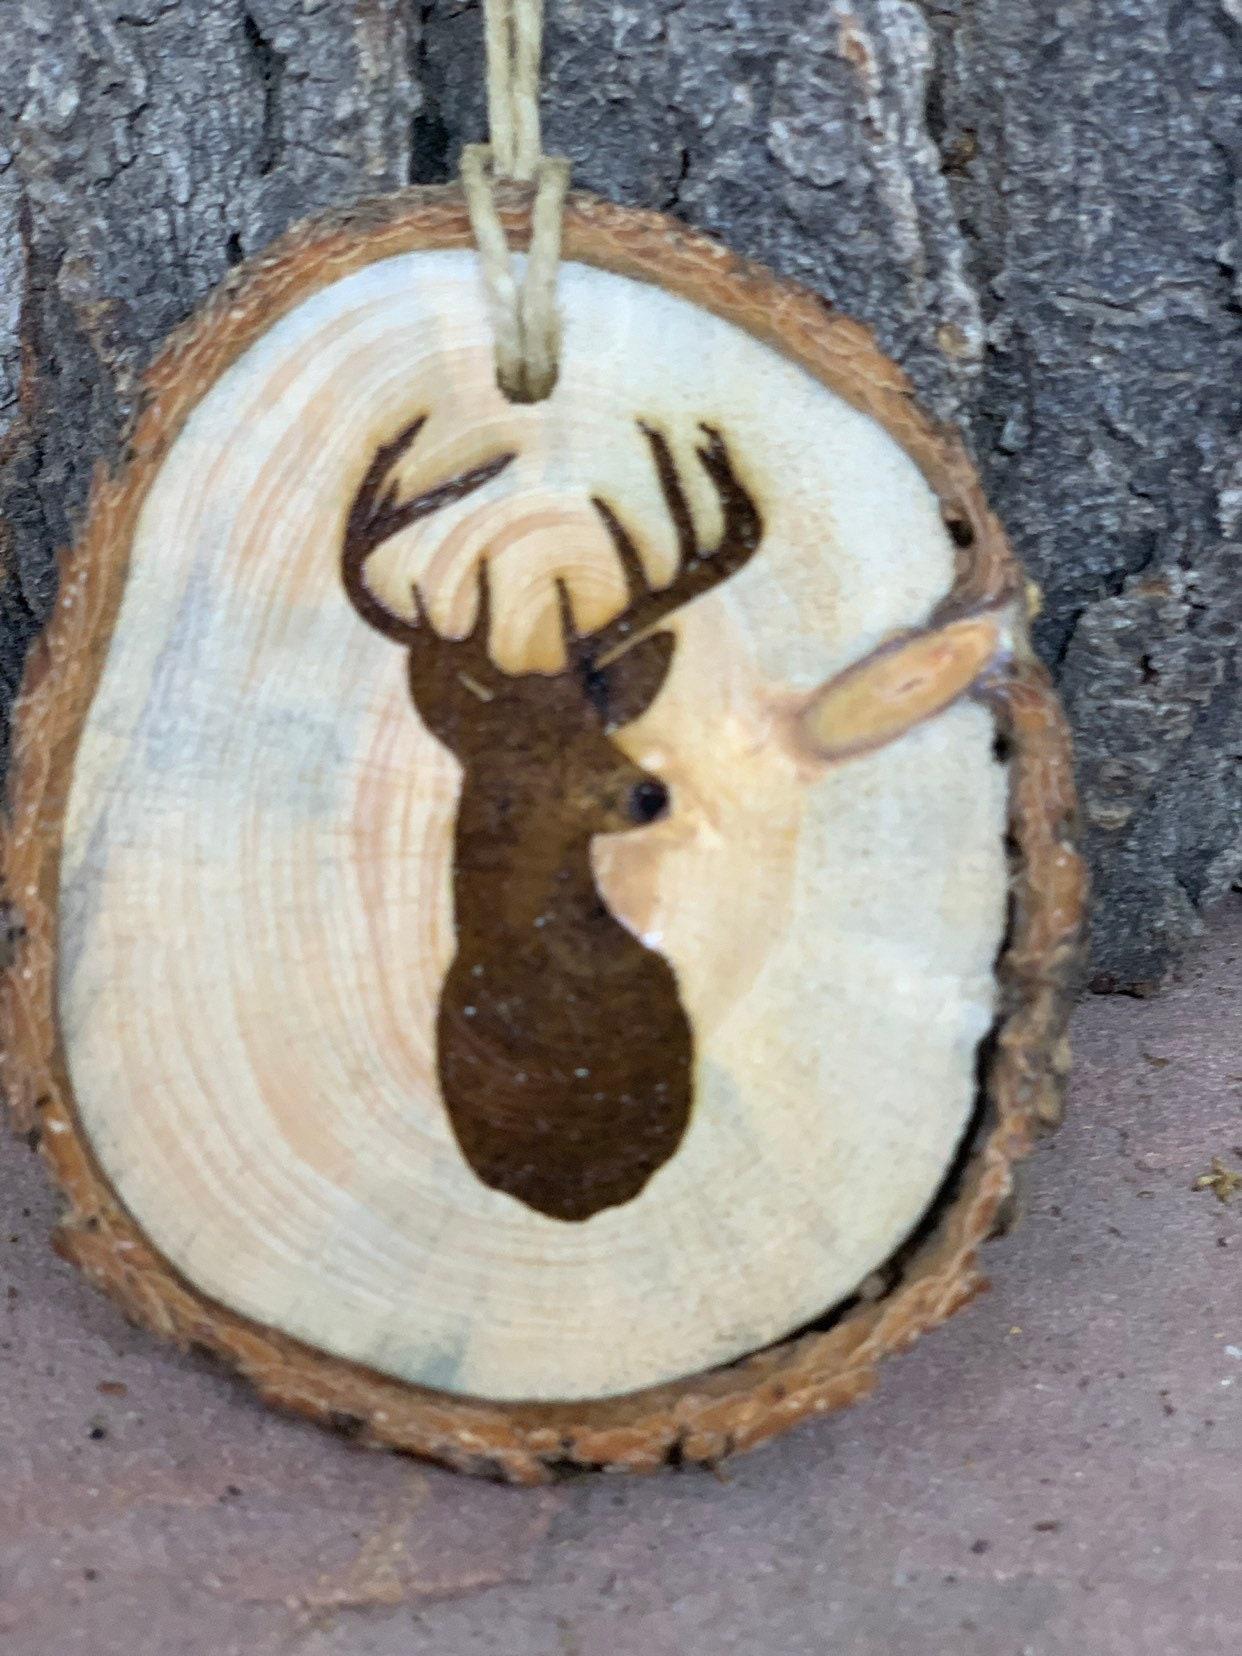 Rustic Wood Ornament Laser Engraved Ornament Deer Ornament Pinon Wood Ornament Pine Ornament Wood Ornament Laser Ornament